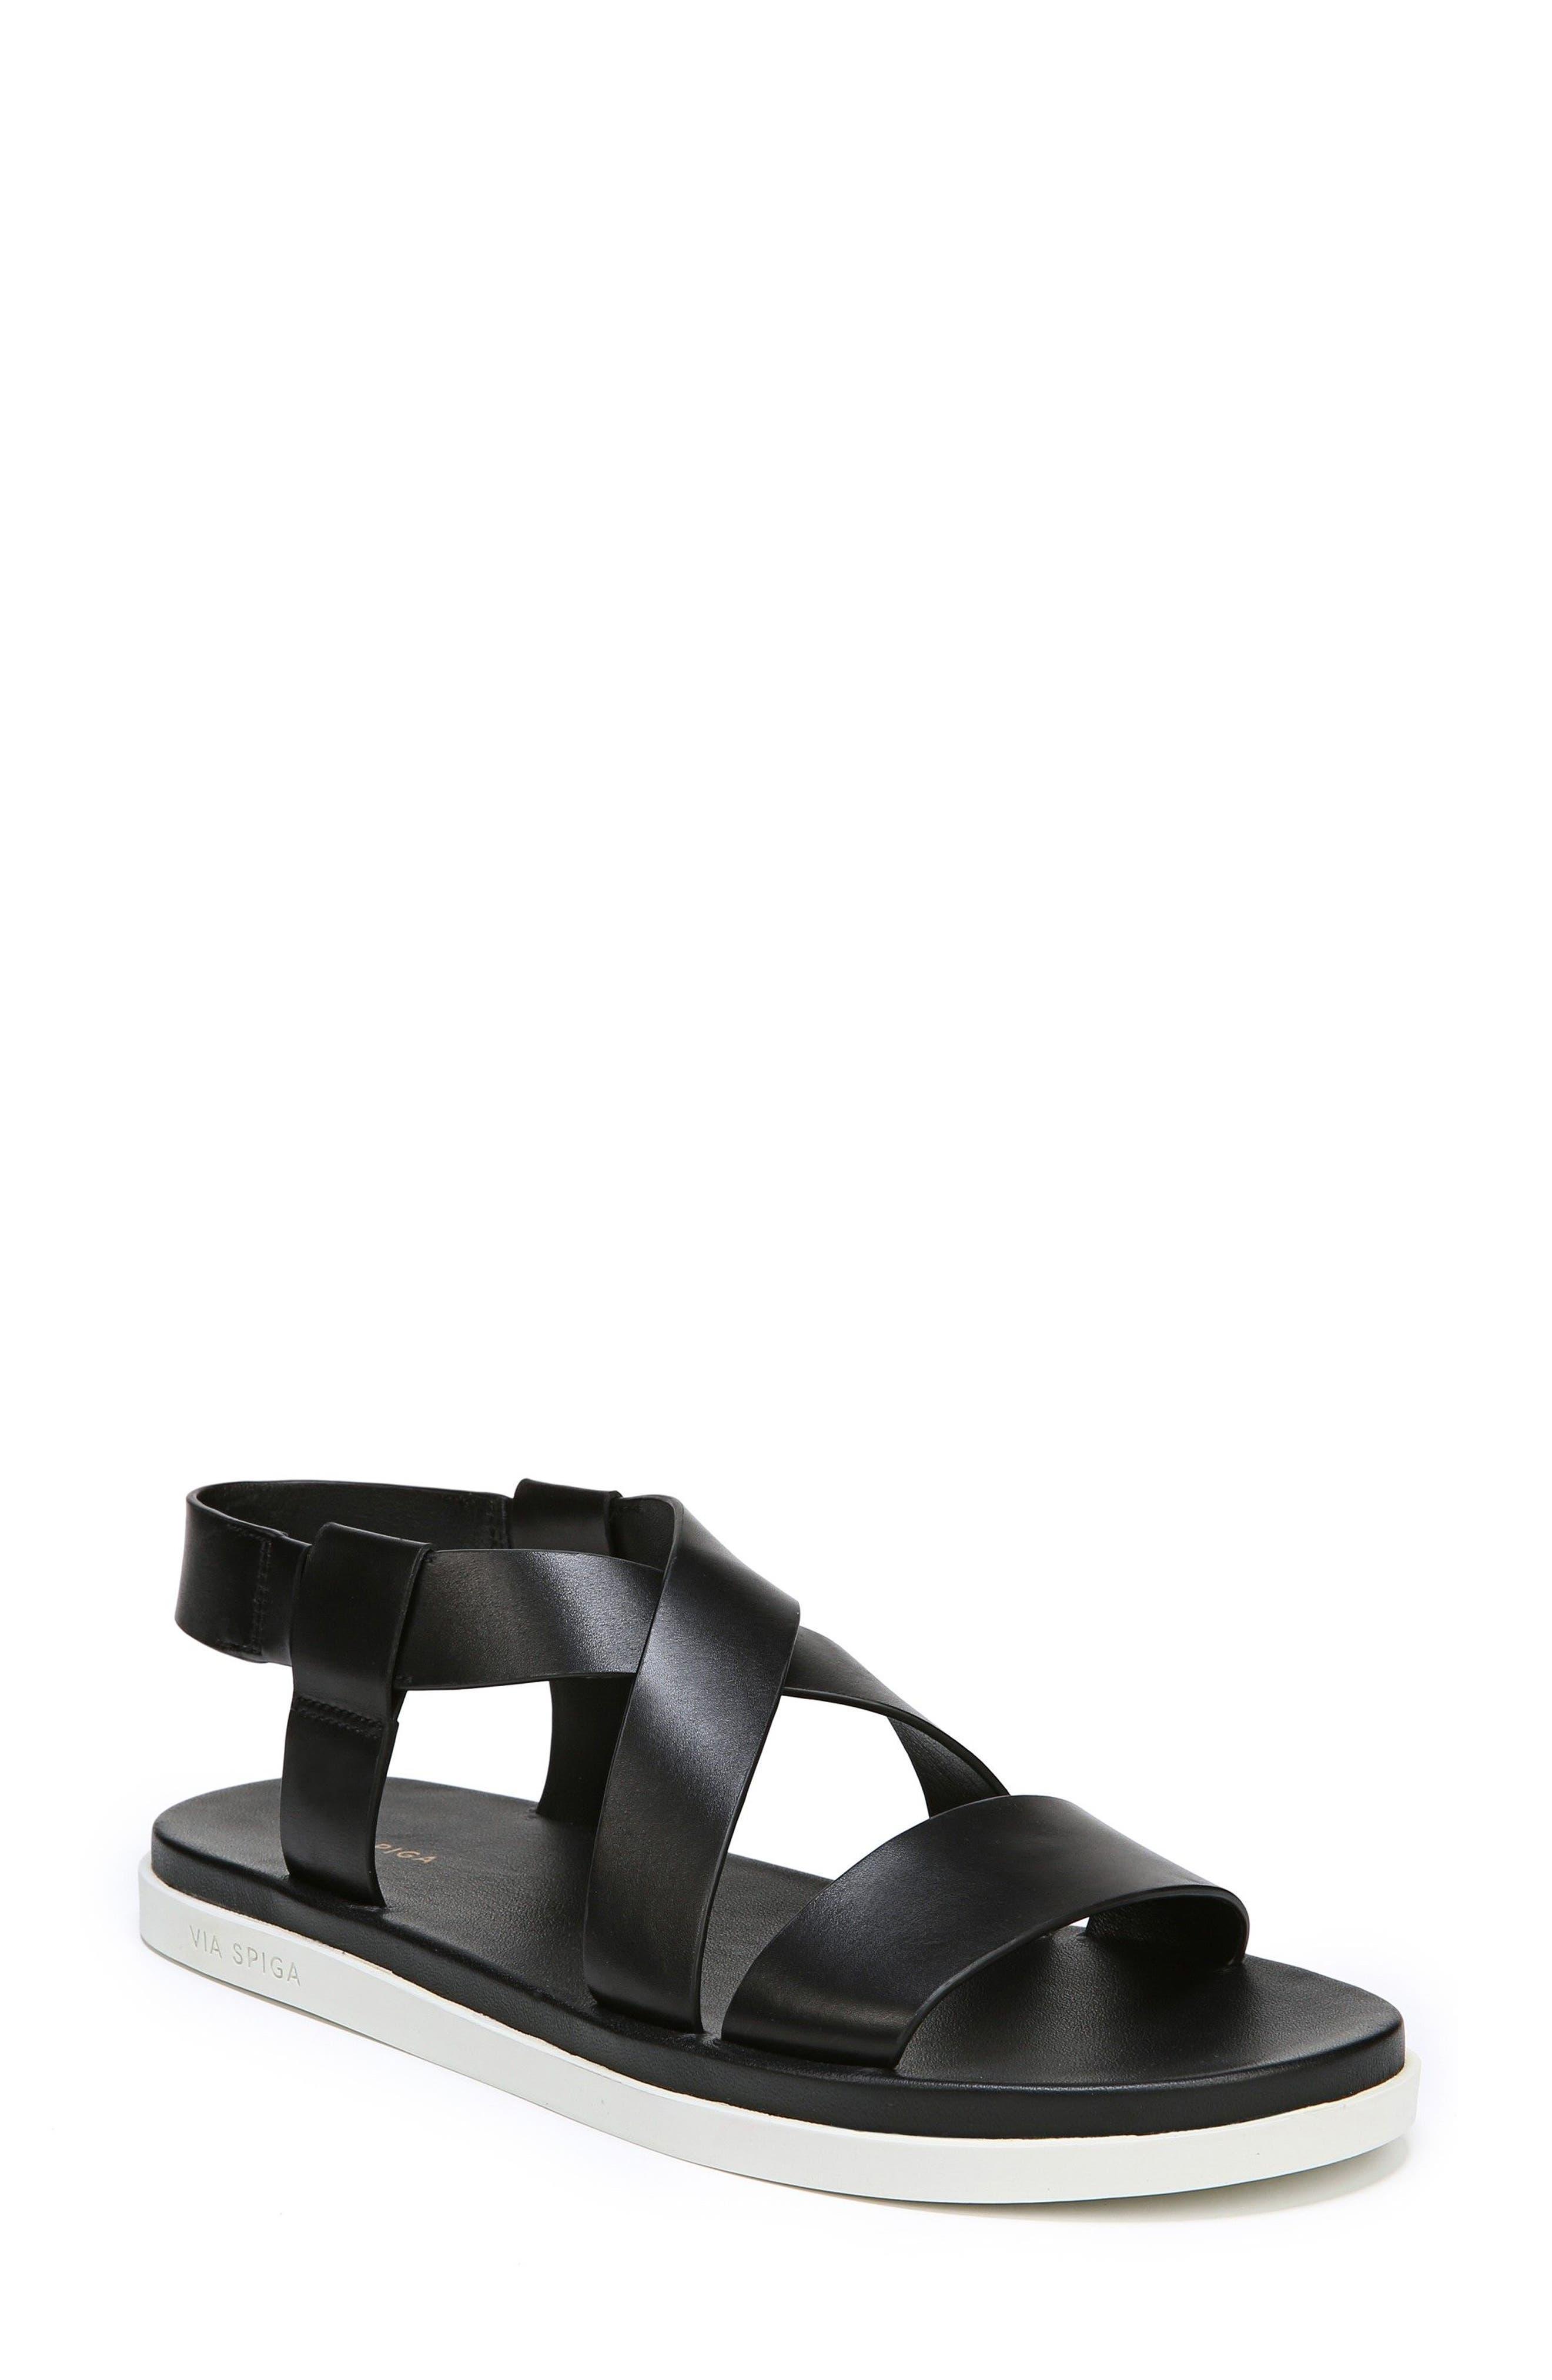 Kalia Strappy Sandal,                         Main,                         color,